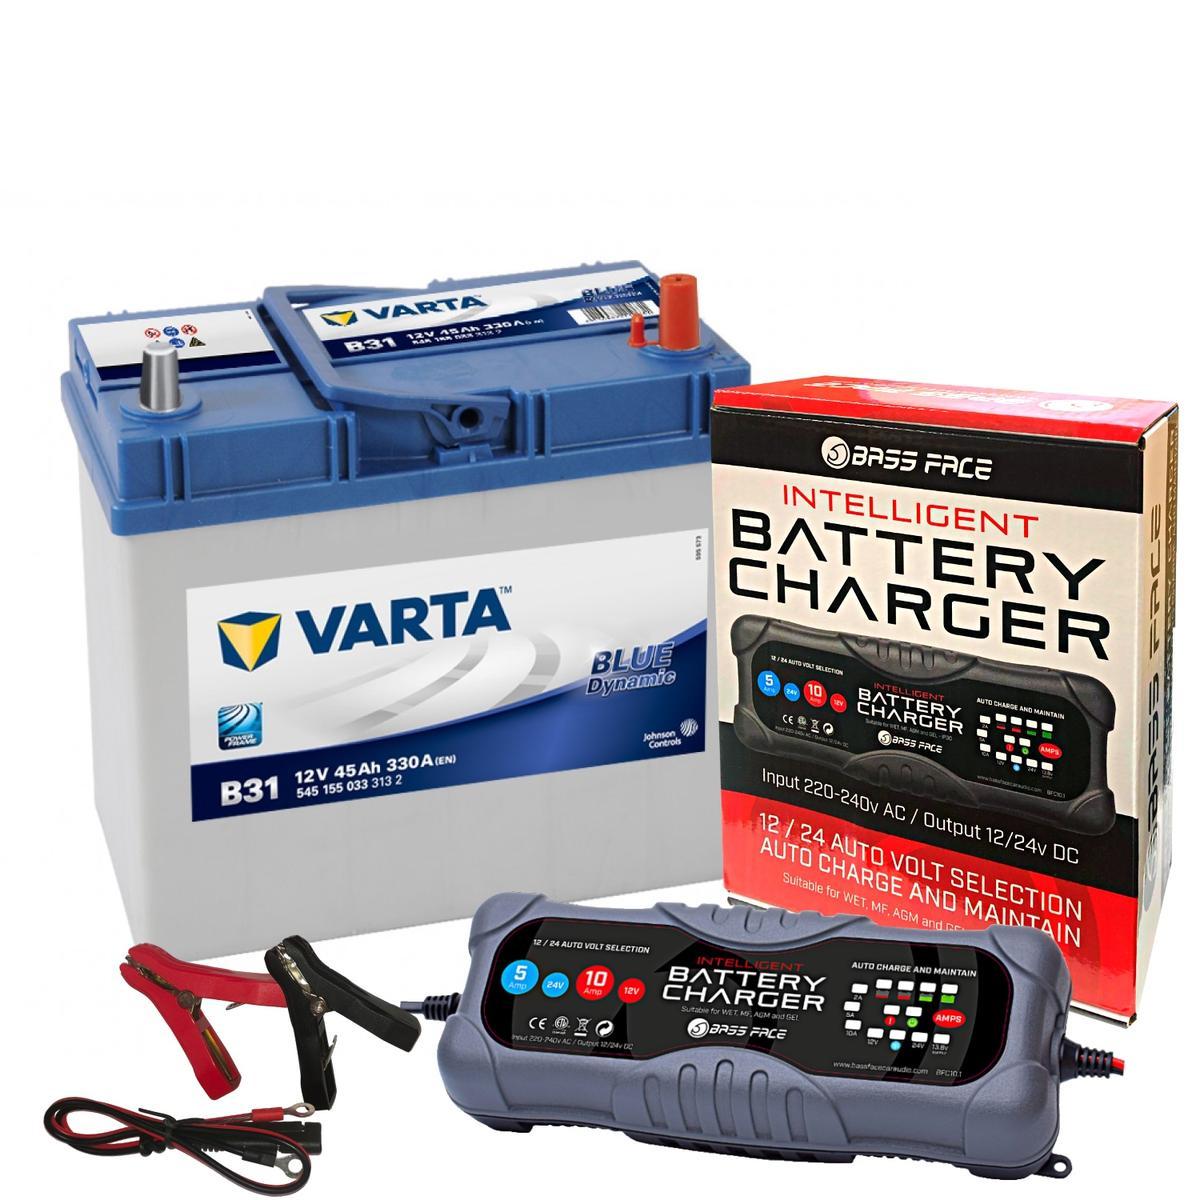 Varta B31 Suzuki Car Battery 12v 4 Year 156 / 054 45Ah 330CCA W/ 10 Amp Charger